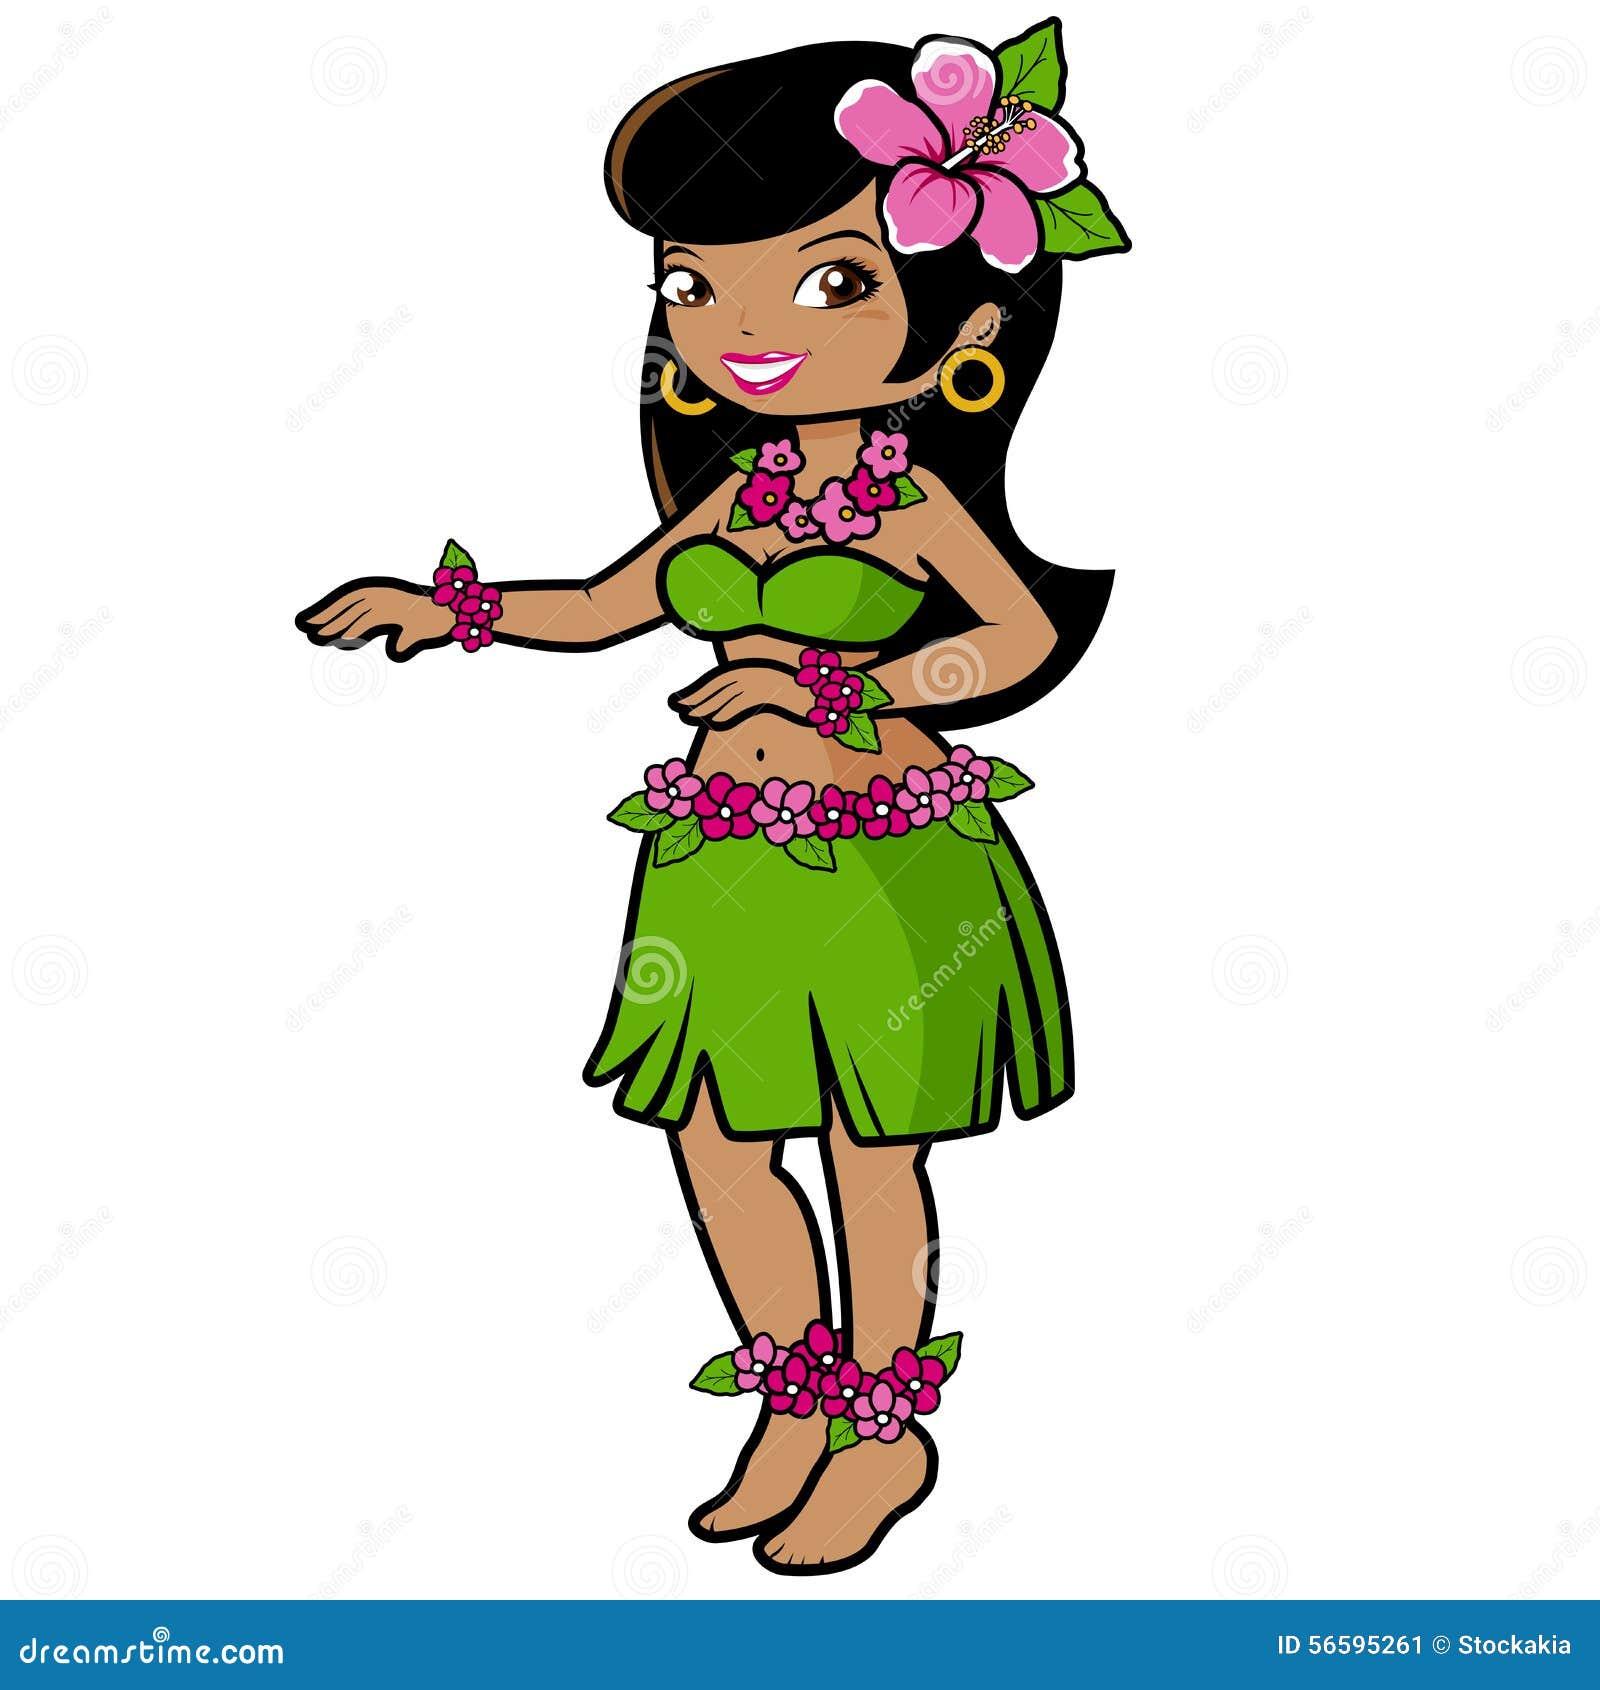 hawaiian hula girl dancer stock vector image of guitar player clipart free guitar player clipart